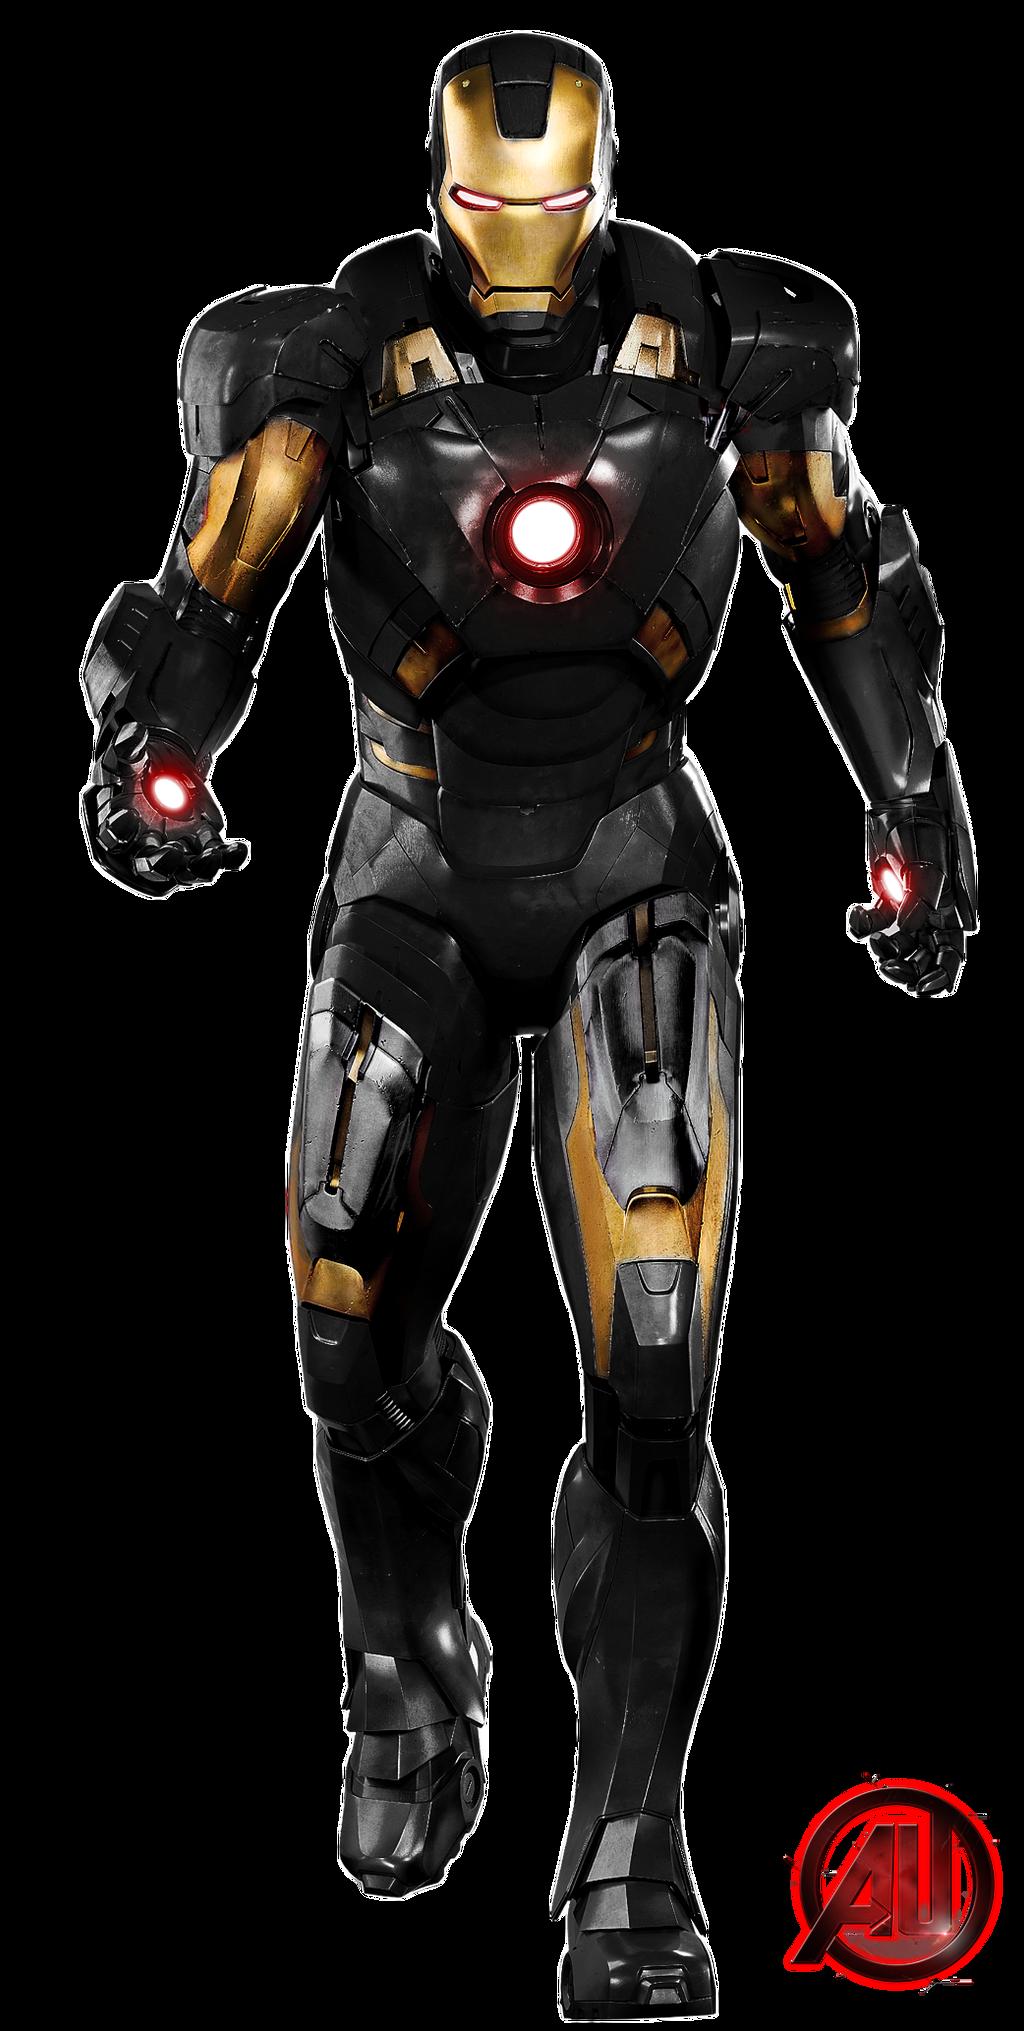 The Avengers Age of Ultron Iron Man Mark 43 Iron Man Mark 43 Age